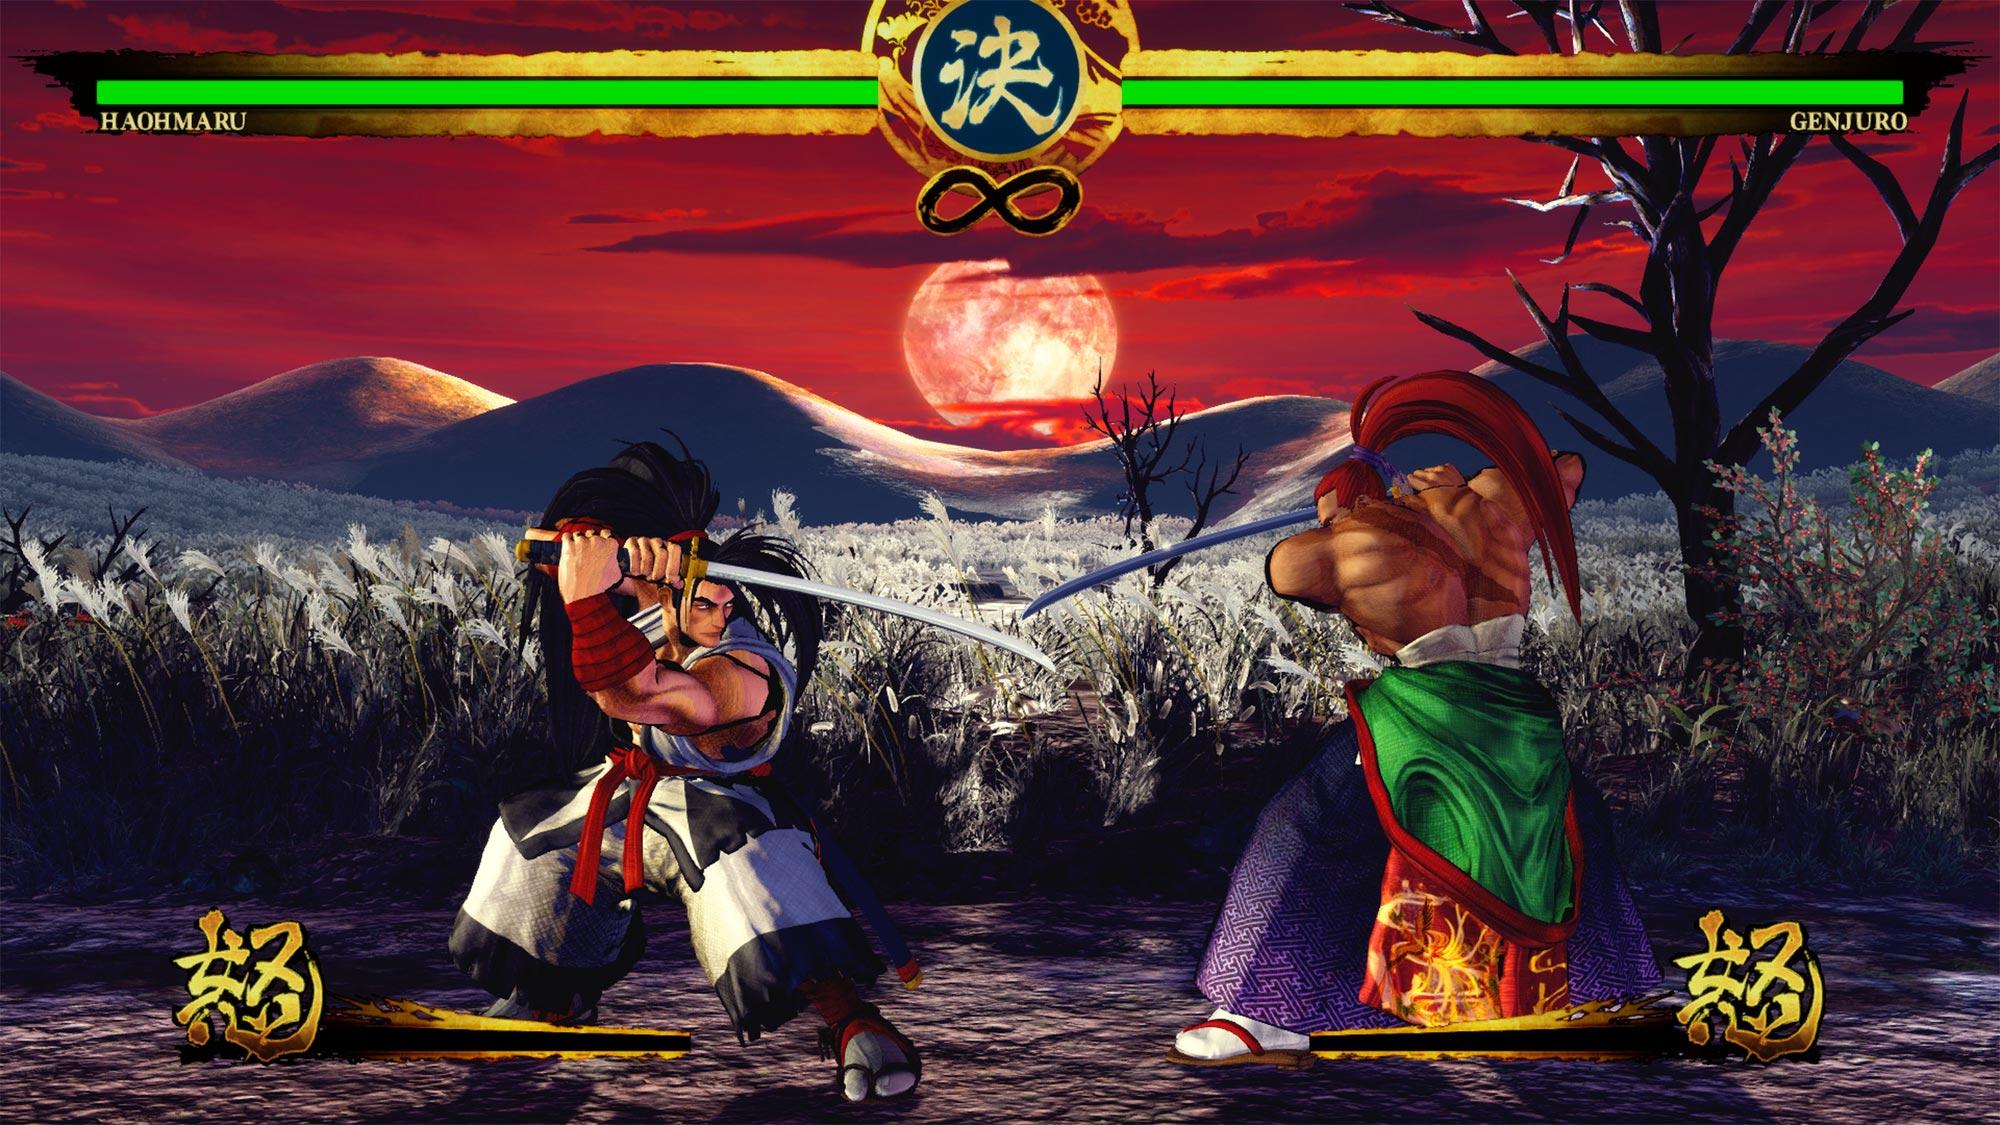 Samurai Shodown screenshots 1 out of 11 image gallery